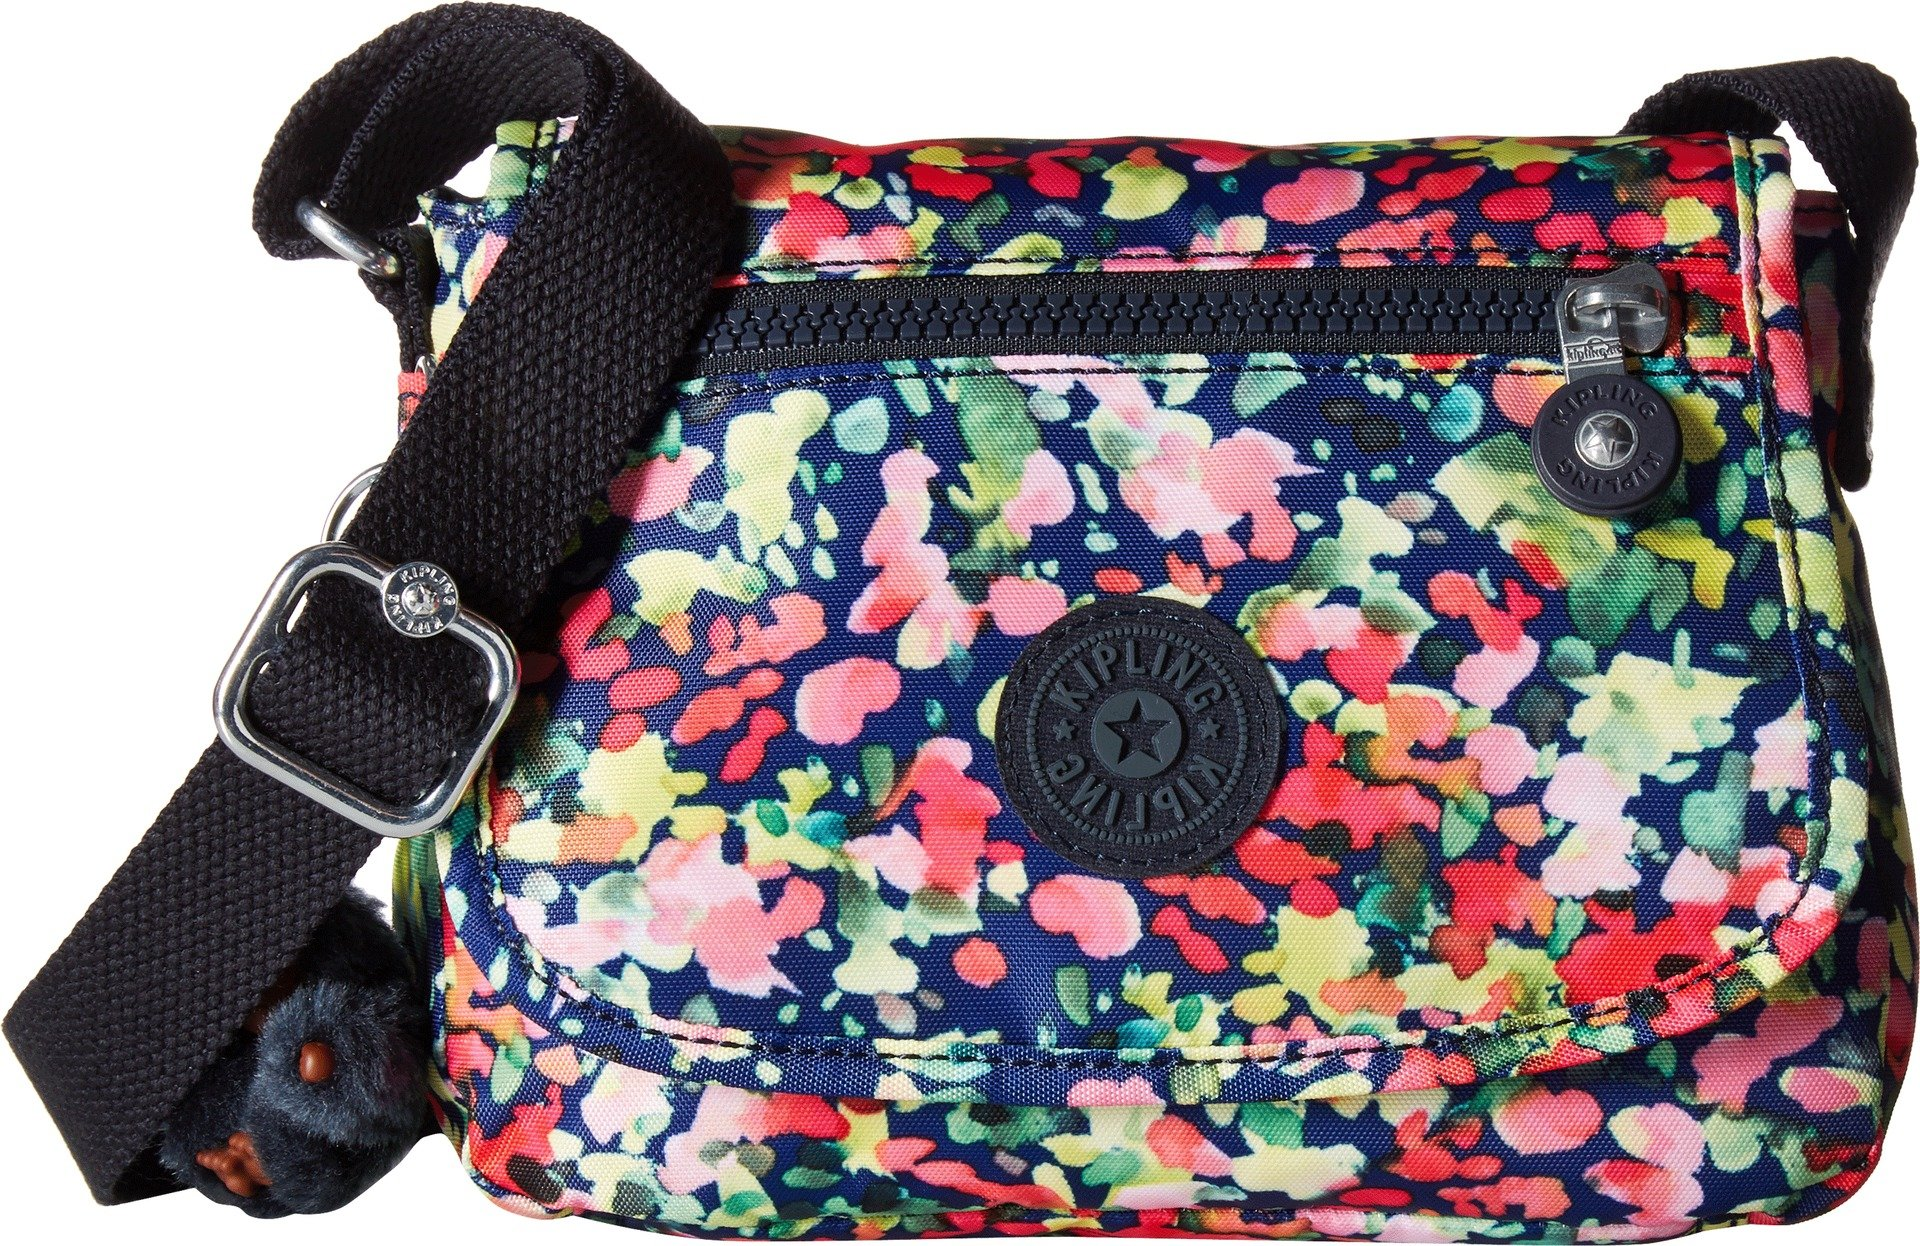 Kipling Sabian Sweet Bouquet Crossbody Minibag